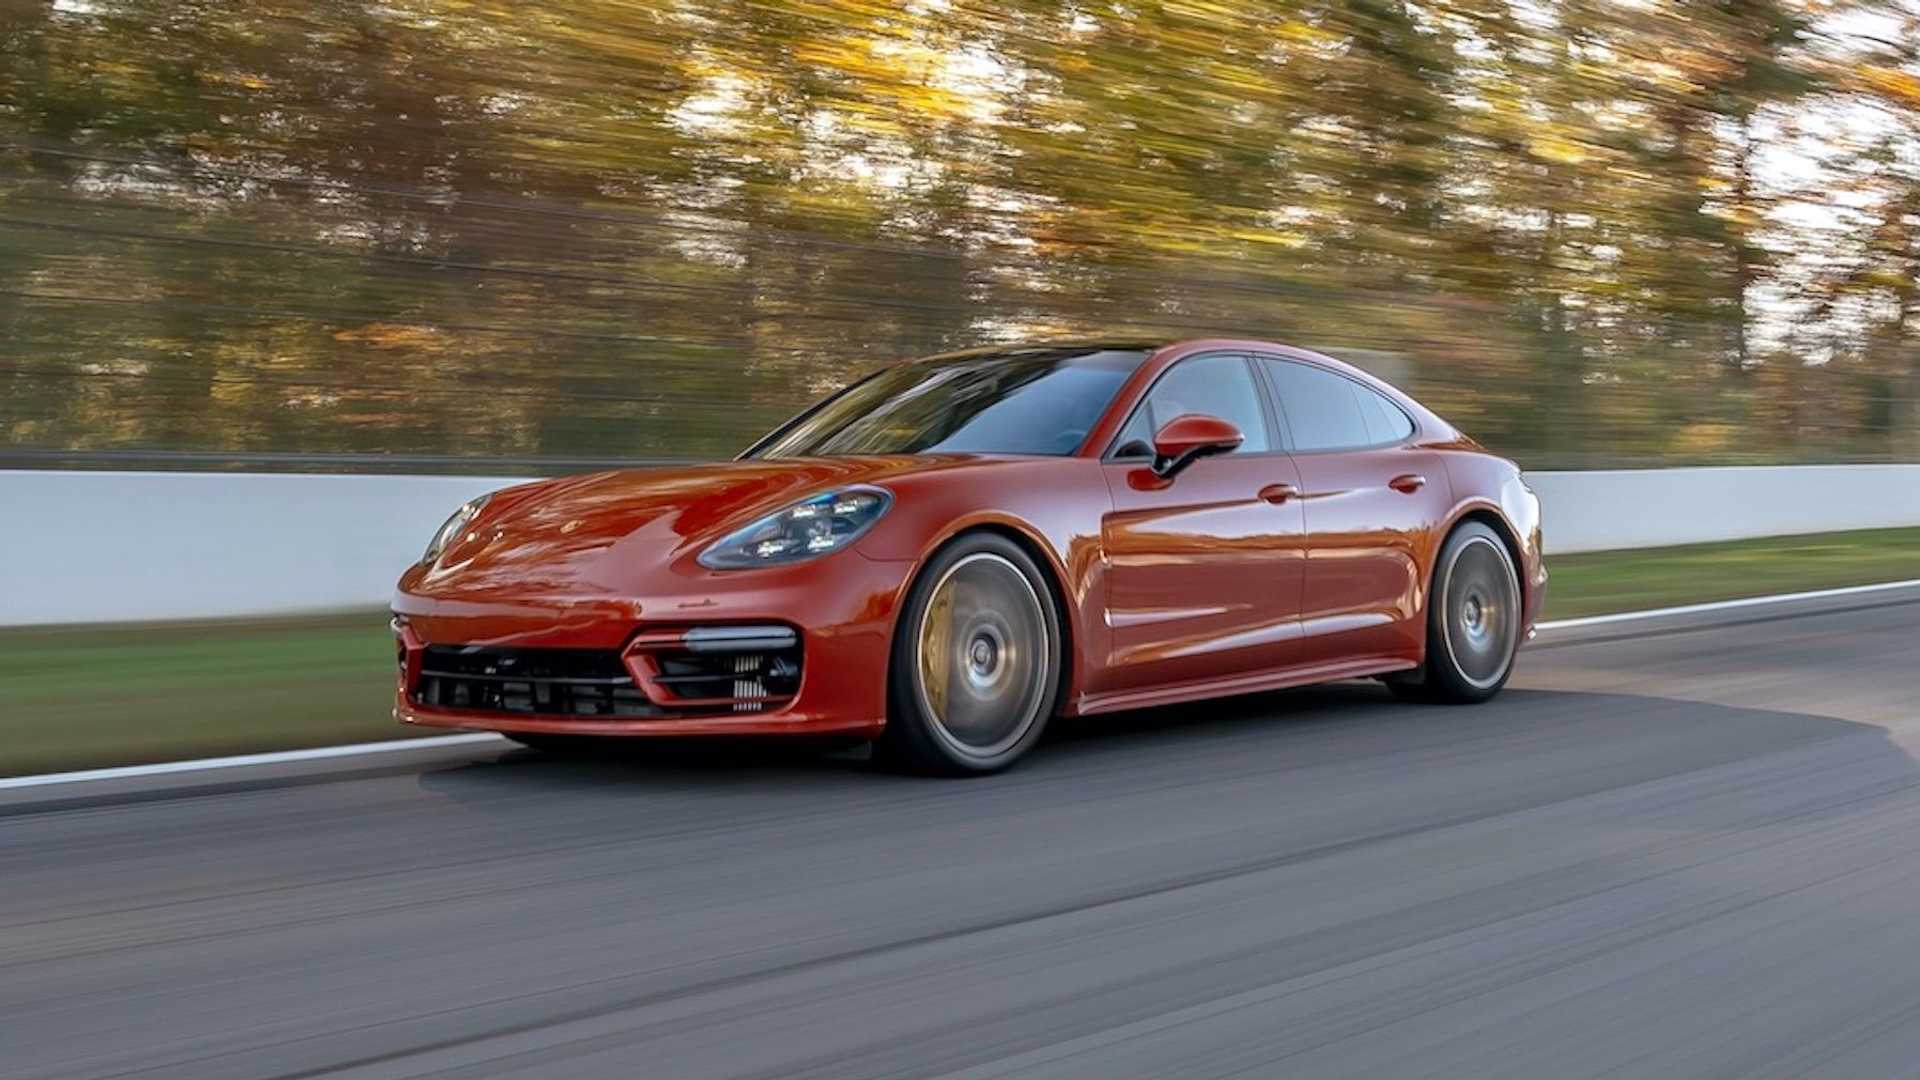 Porsche-Panamera-Turbo-Record-Road-Atlanta-11